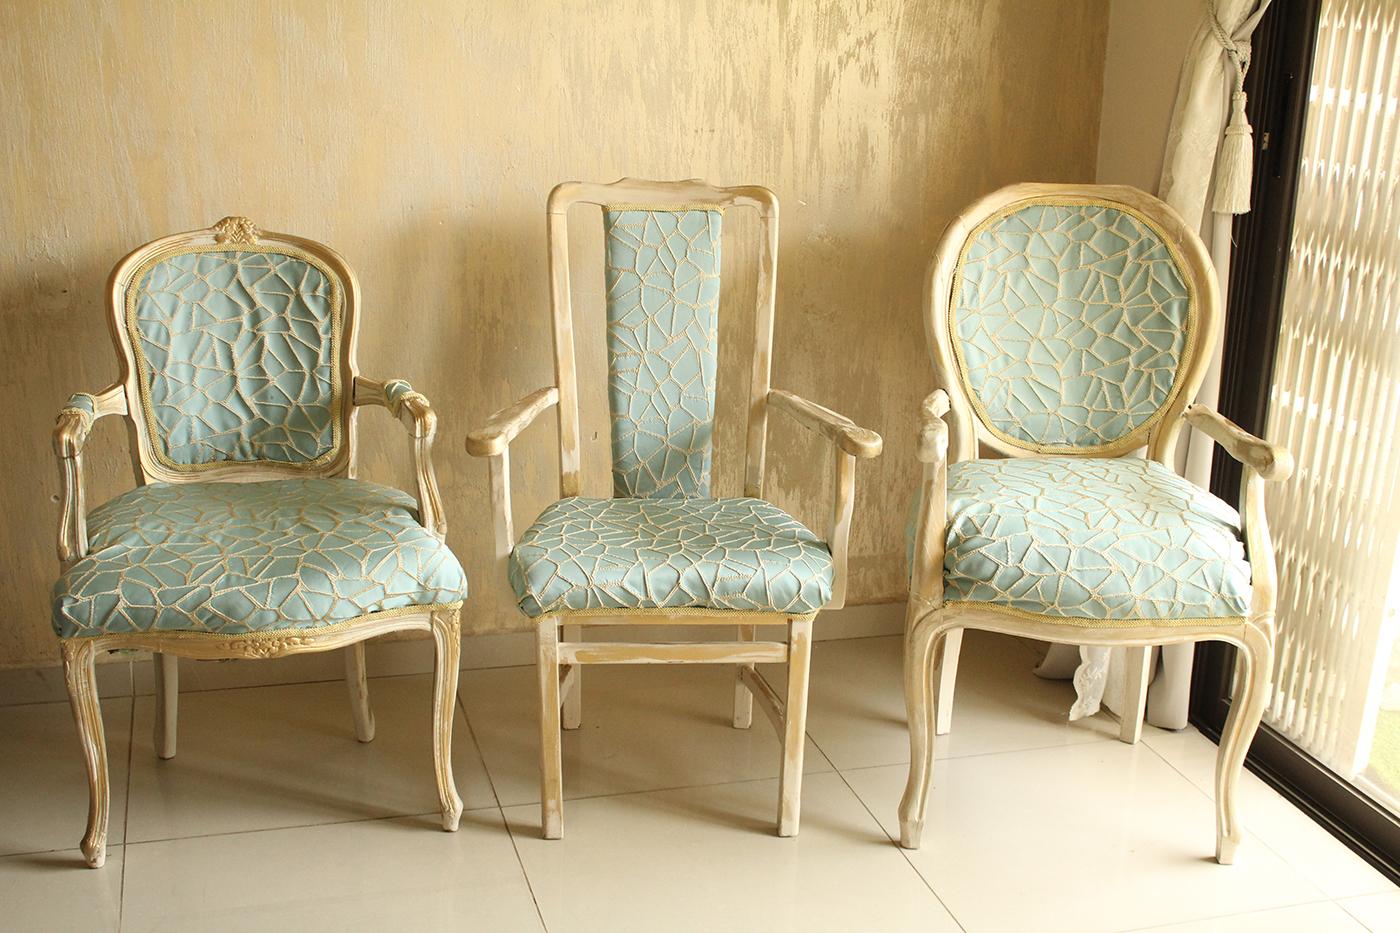 IMG 7965 - חידוש כסא לסט הסלוני